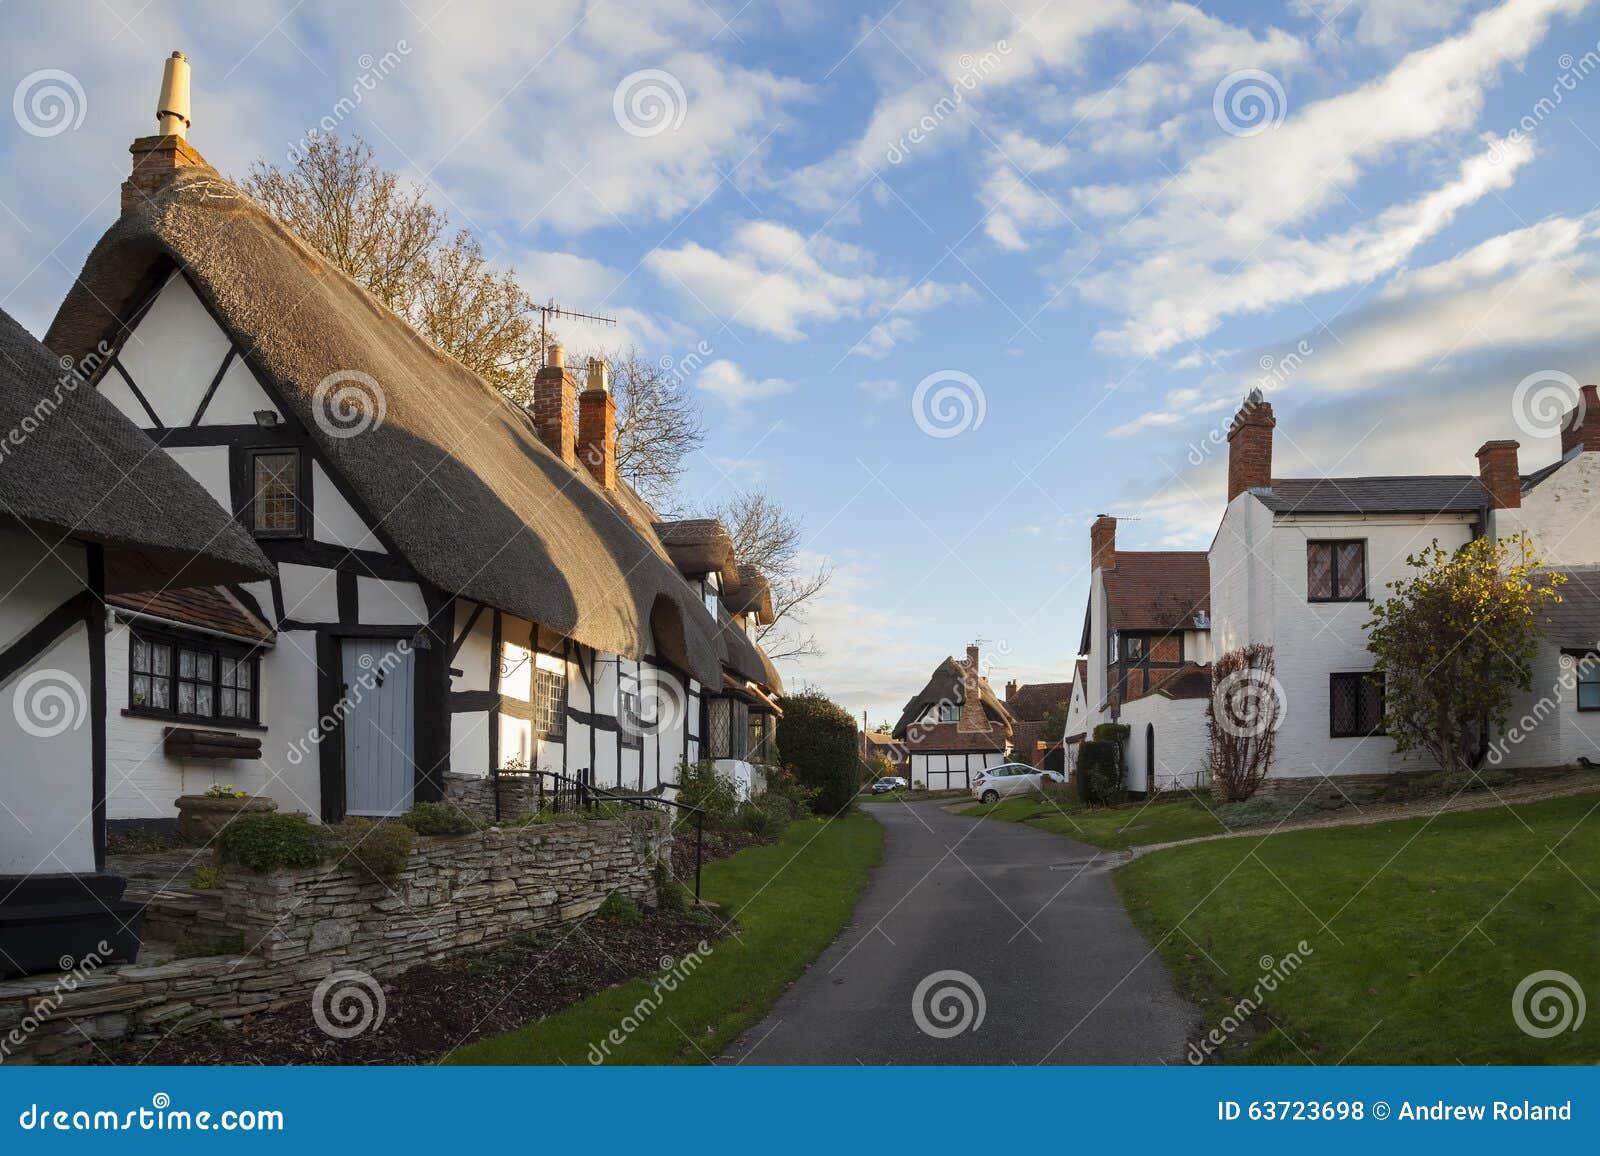 European Cottage House Plans Welford On Avon Village Warwickshire England Stock Photo